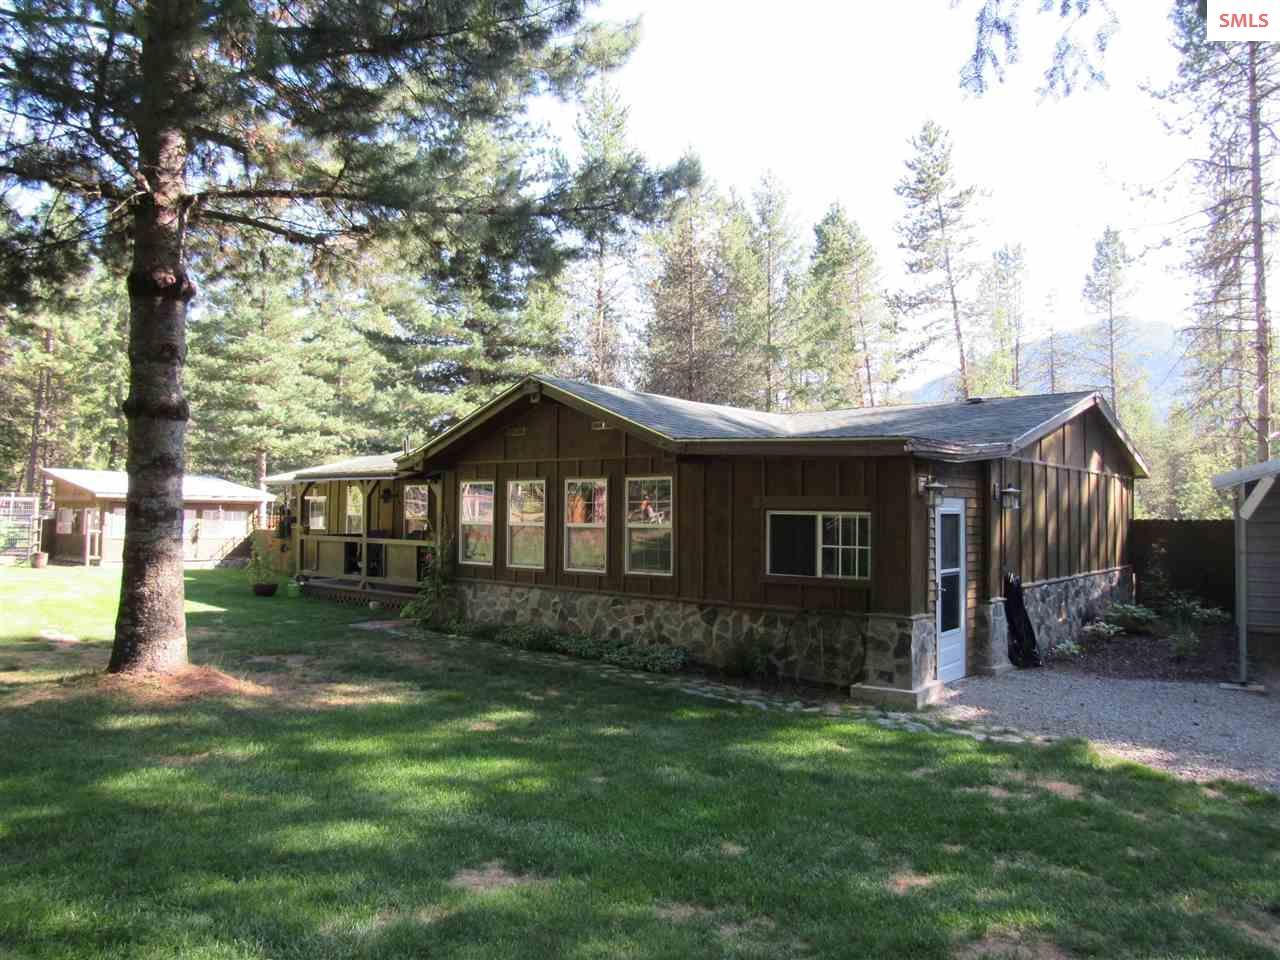 Bonner County Idaho Foreclosure Listings, Bank Owned Homes